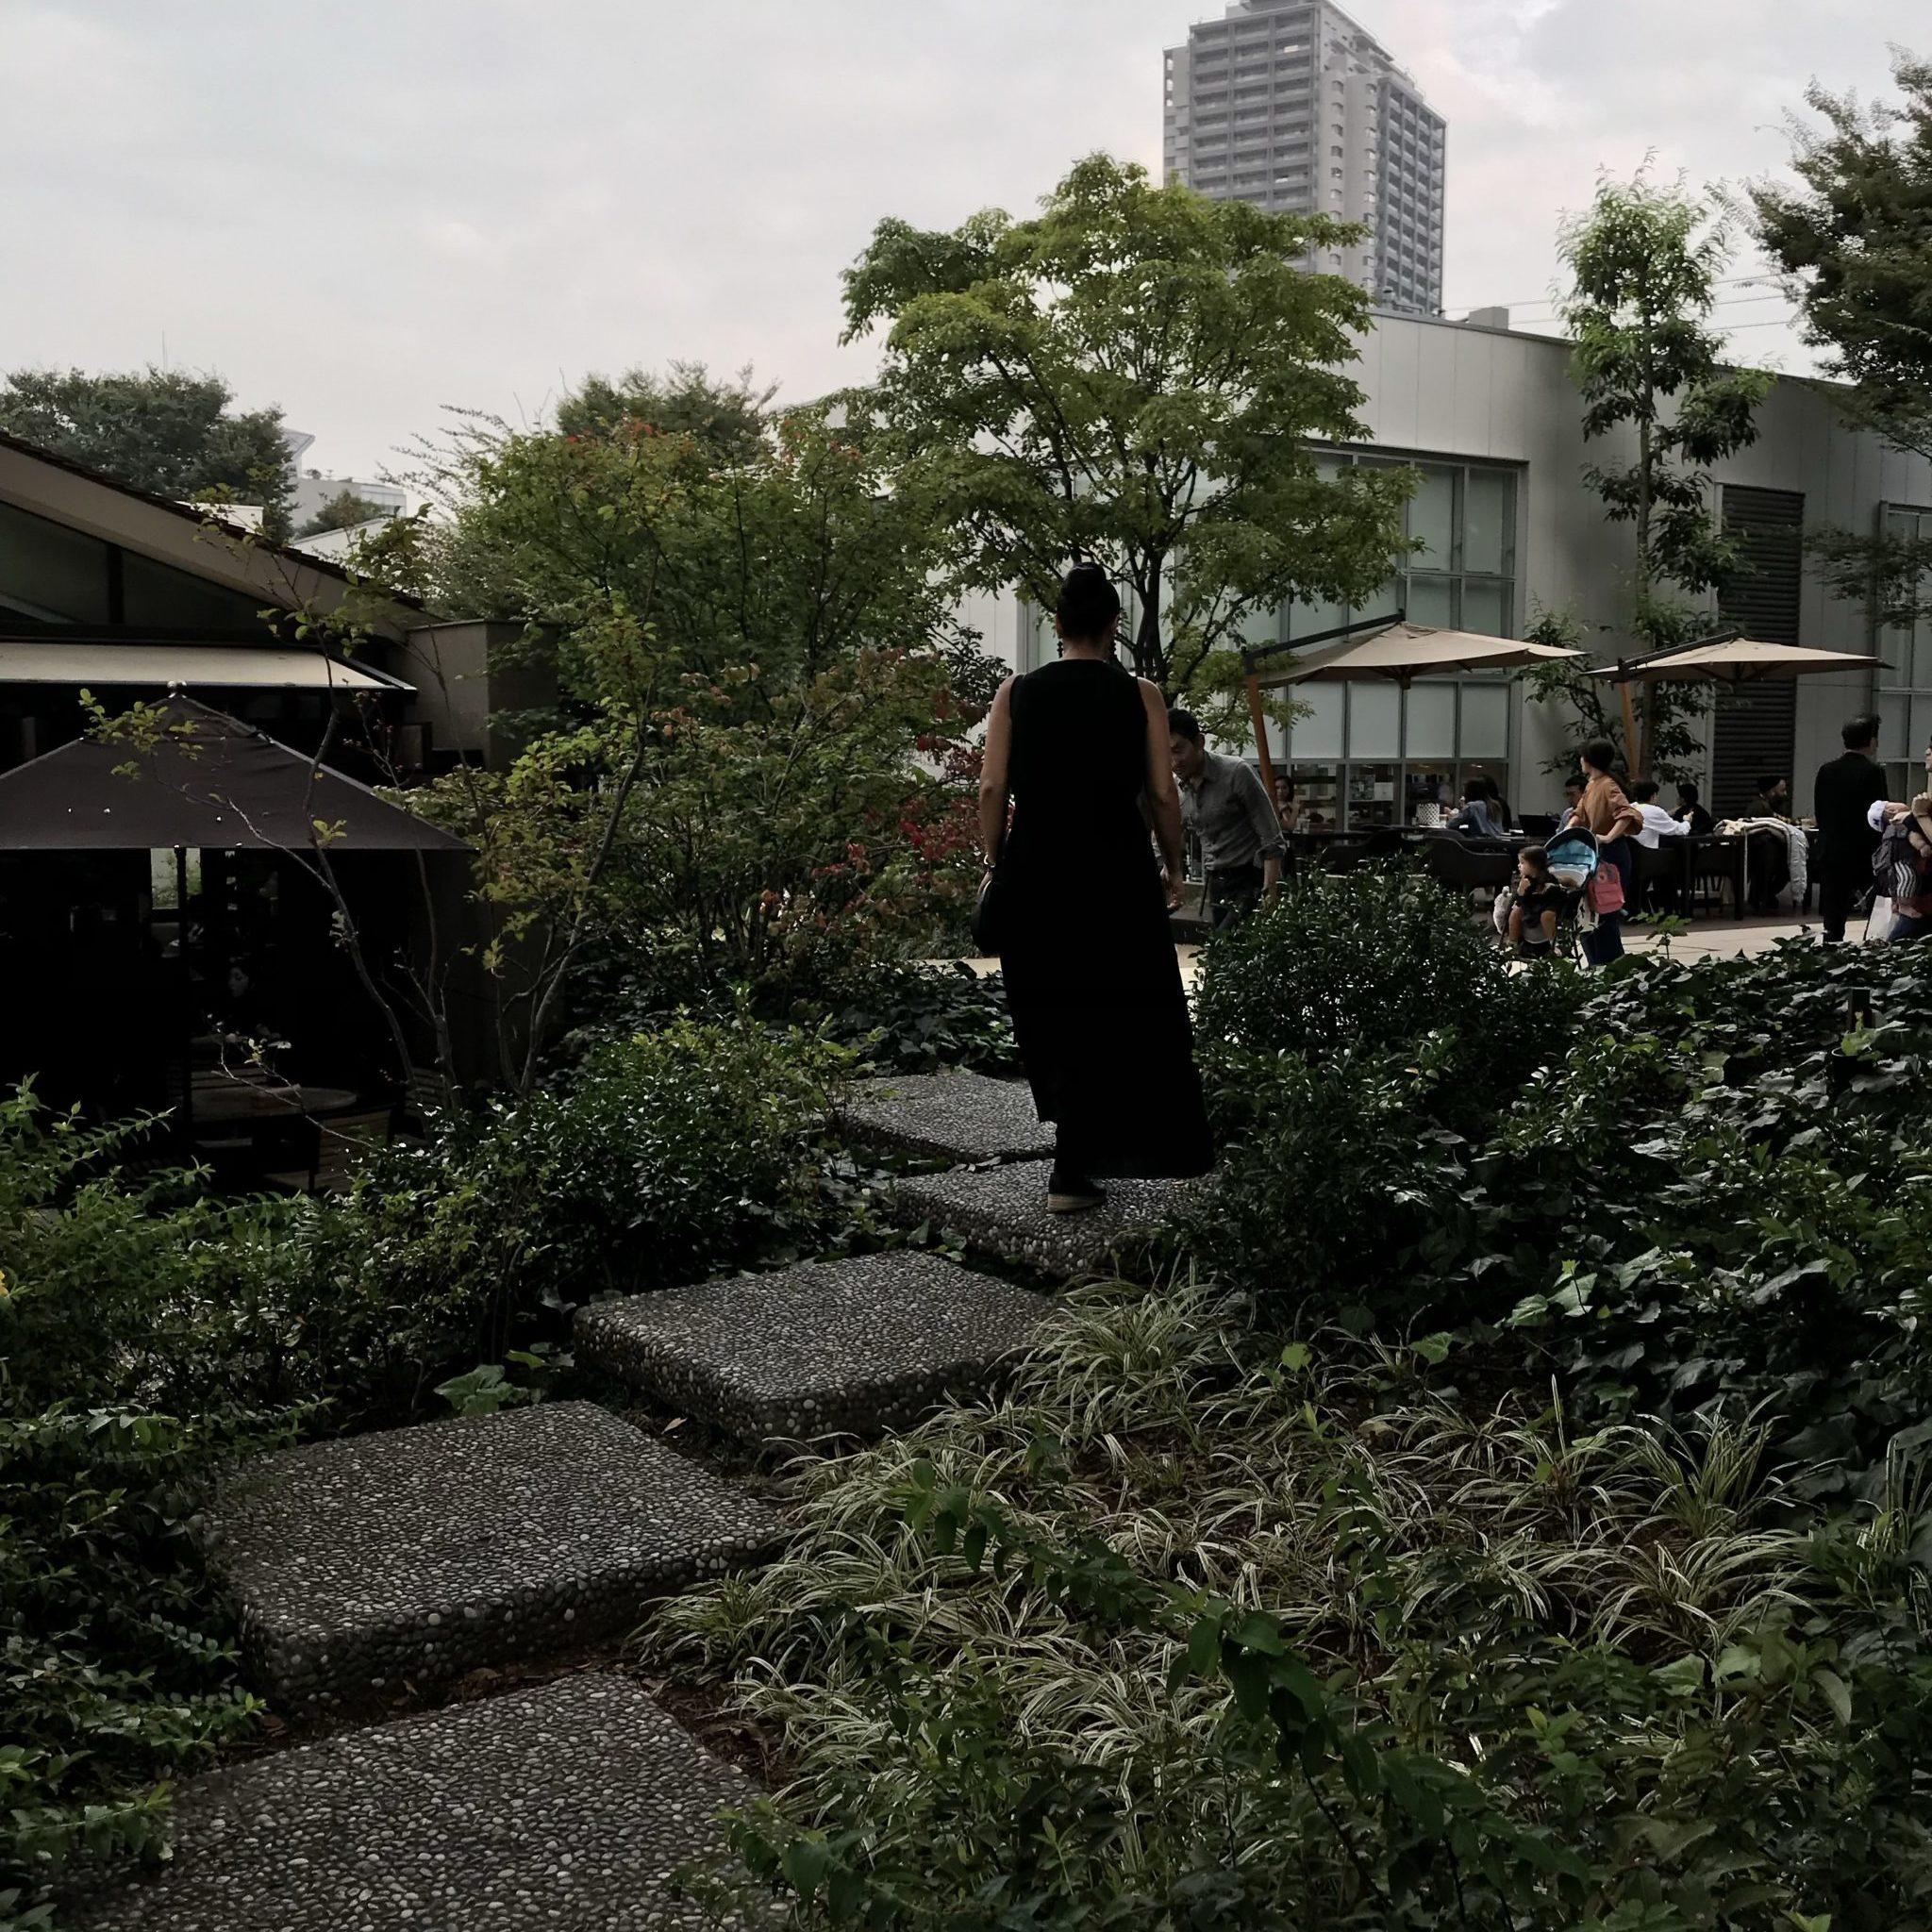 garden tokyo Japan inspiration green plants community